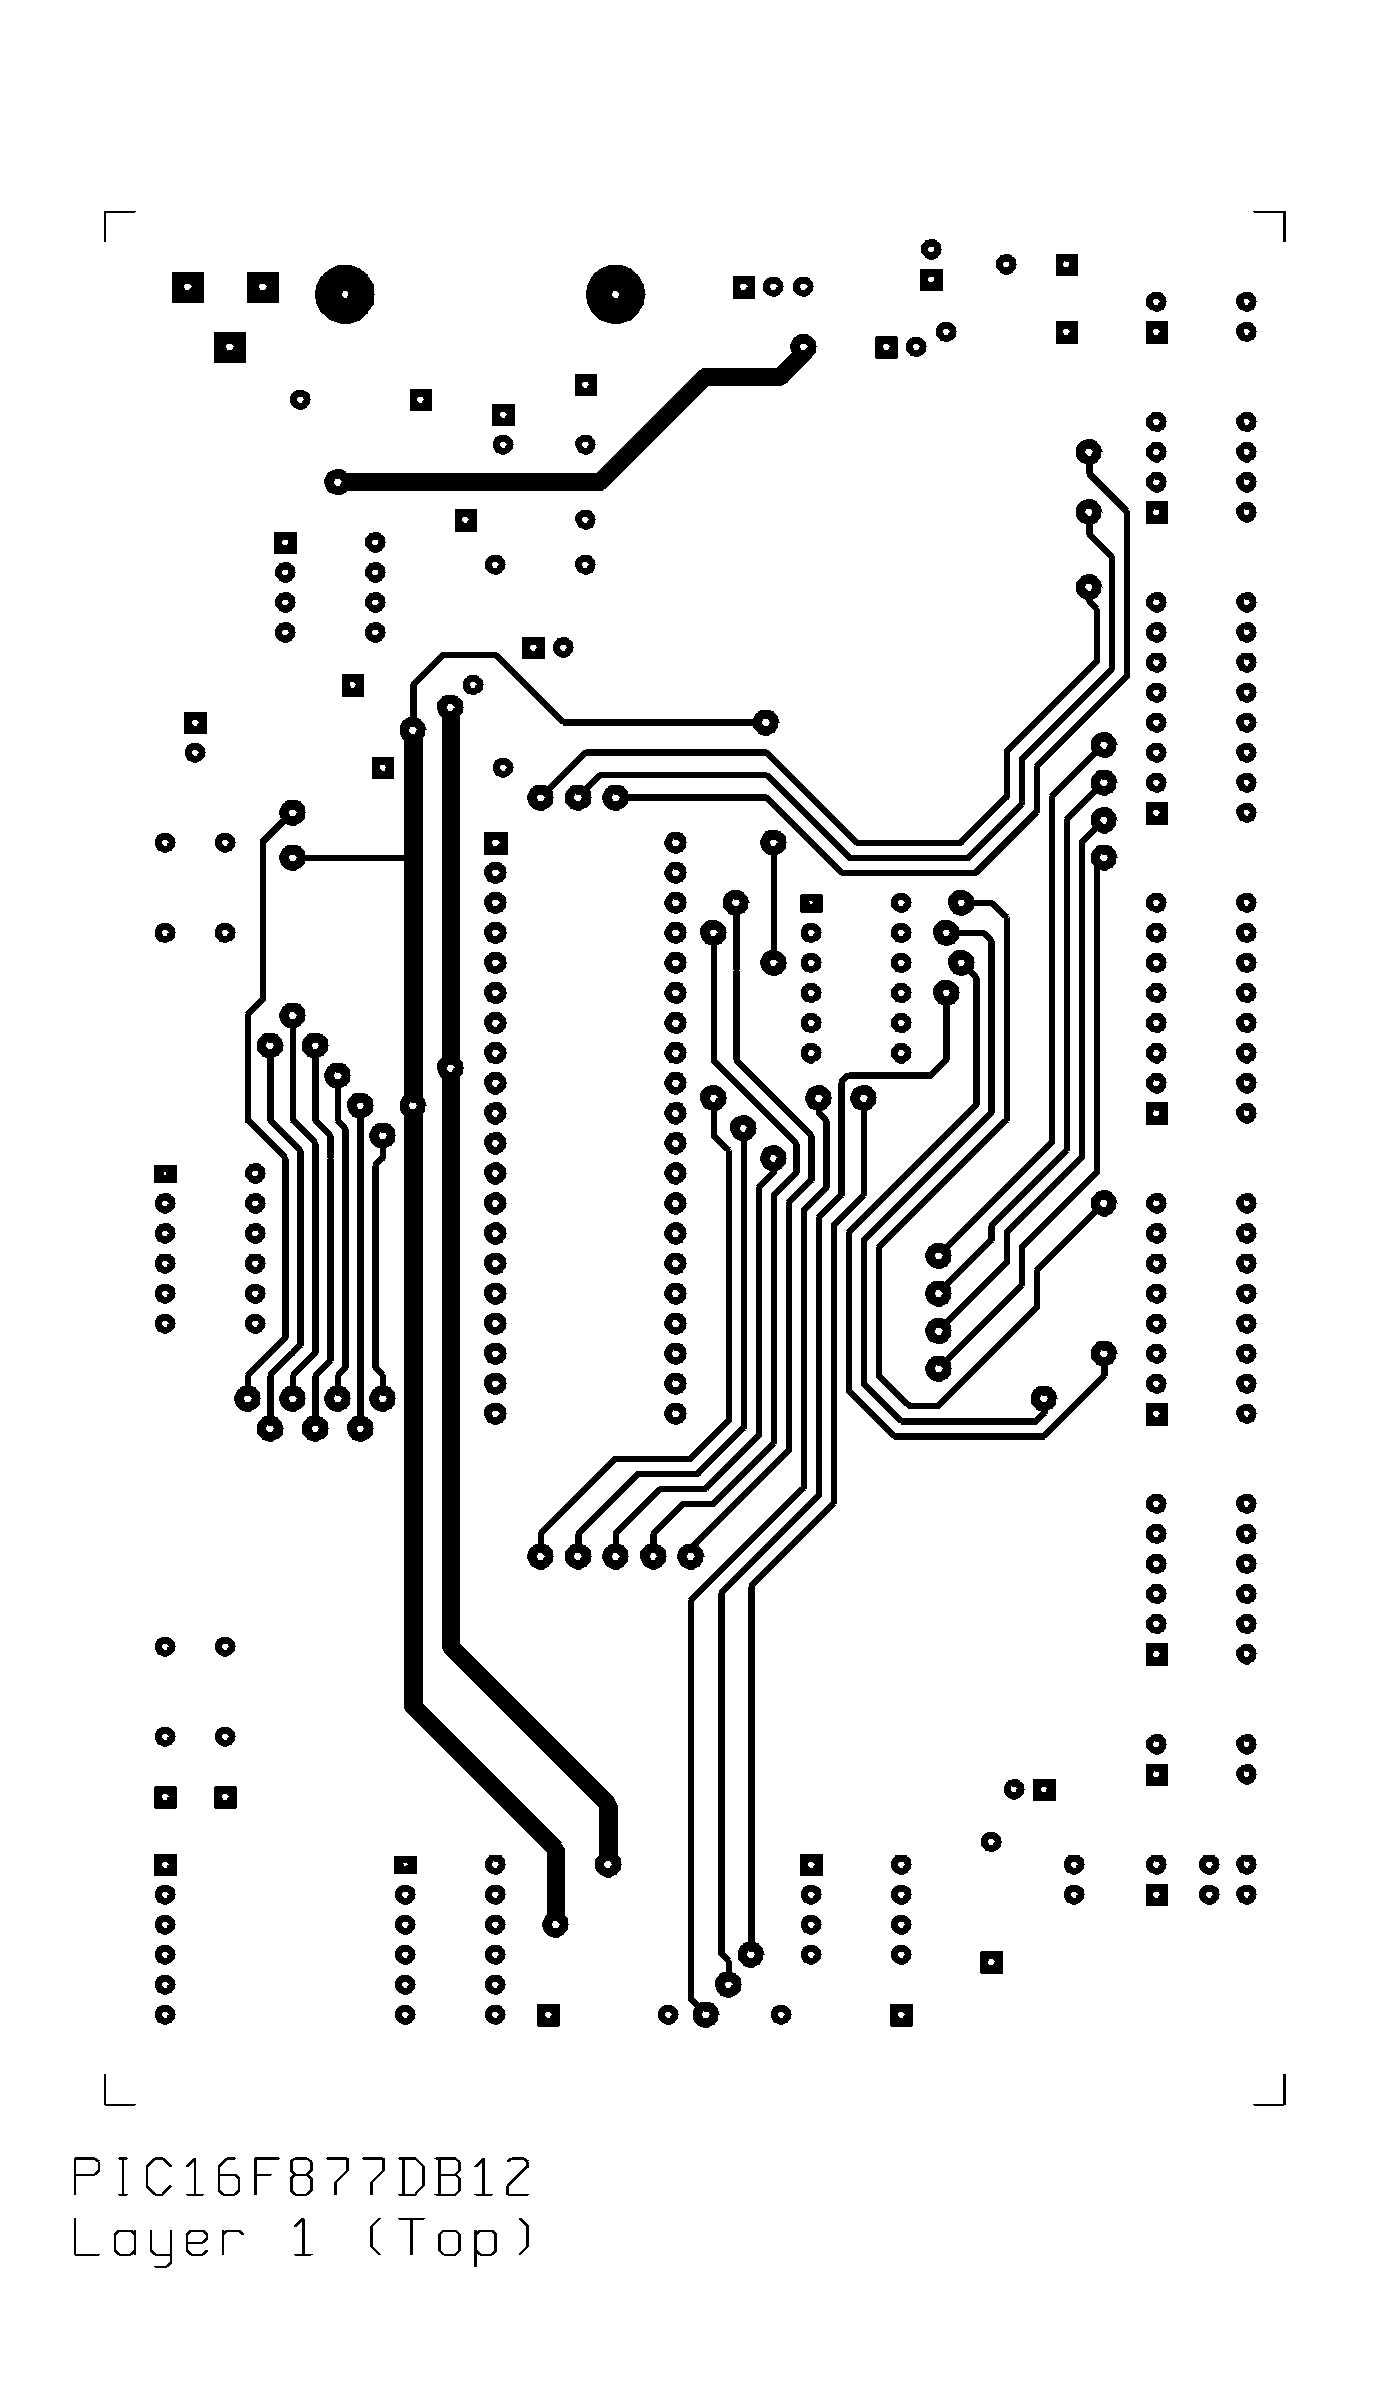 PIC16F877 Development Board v. 1.2